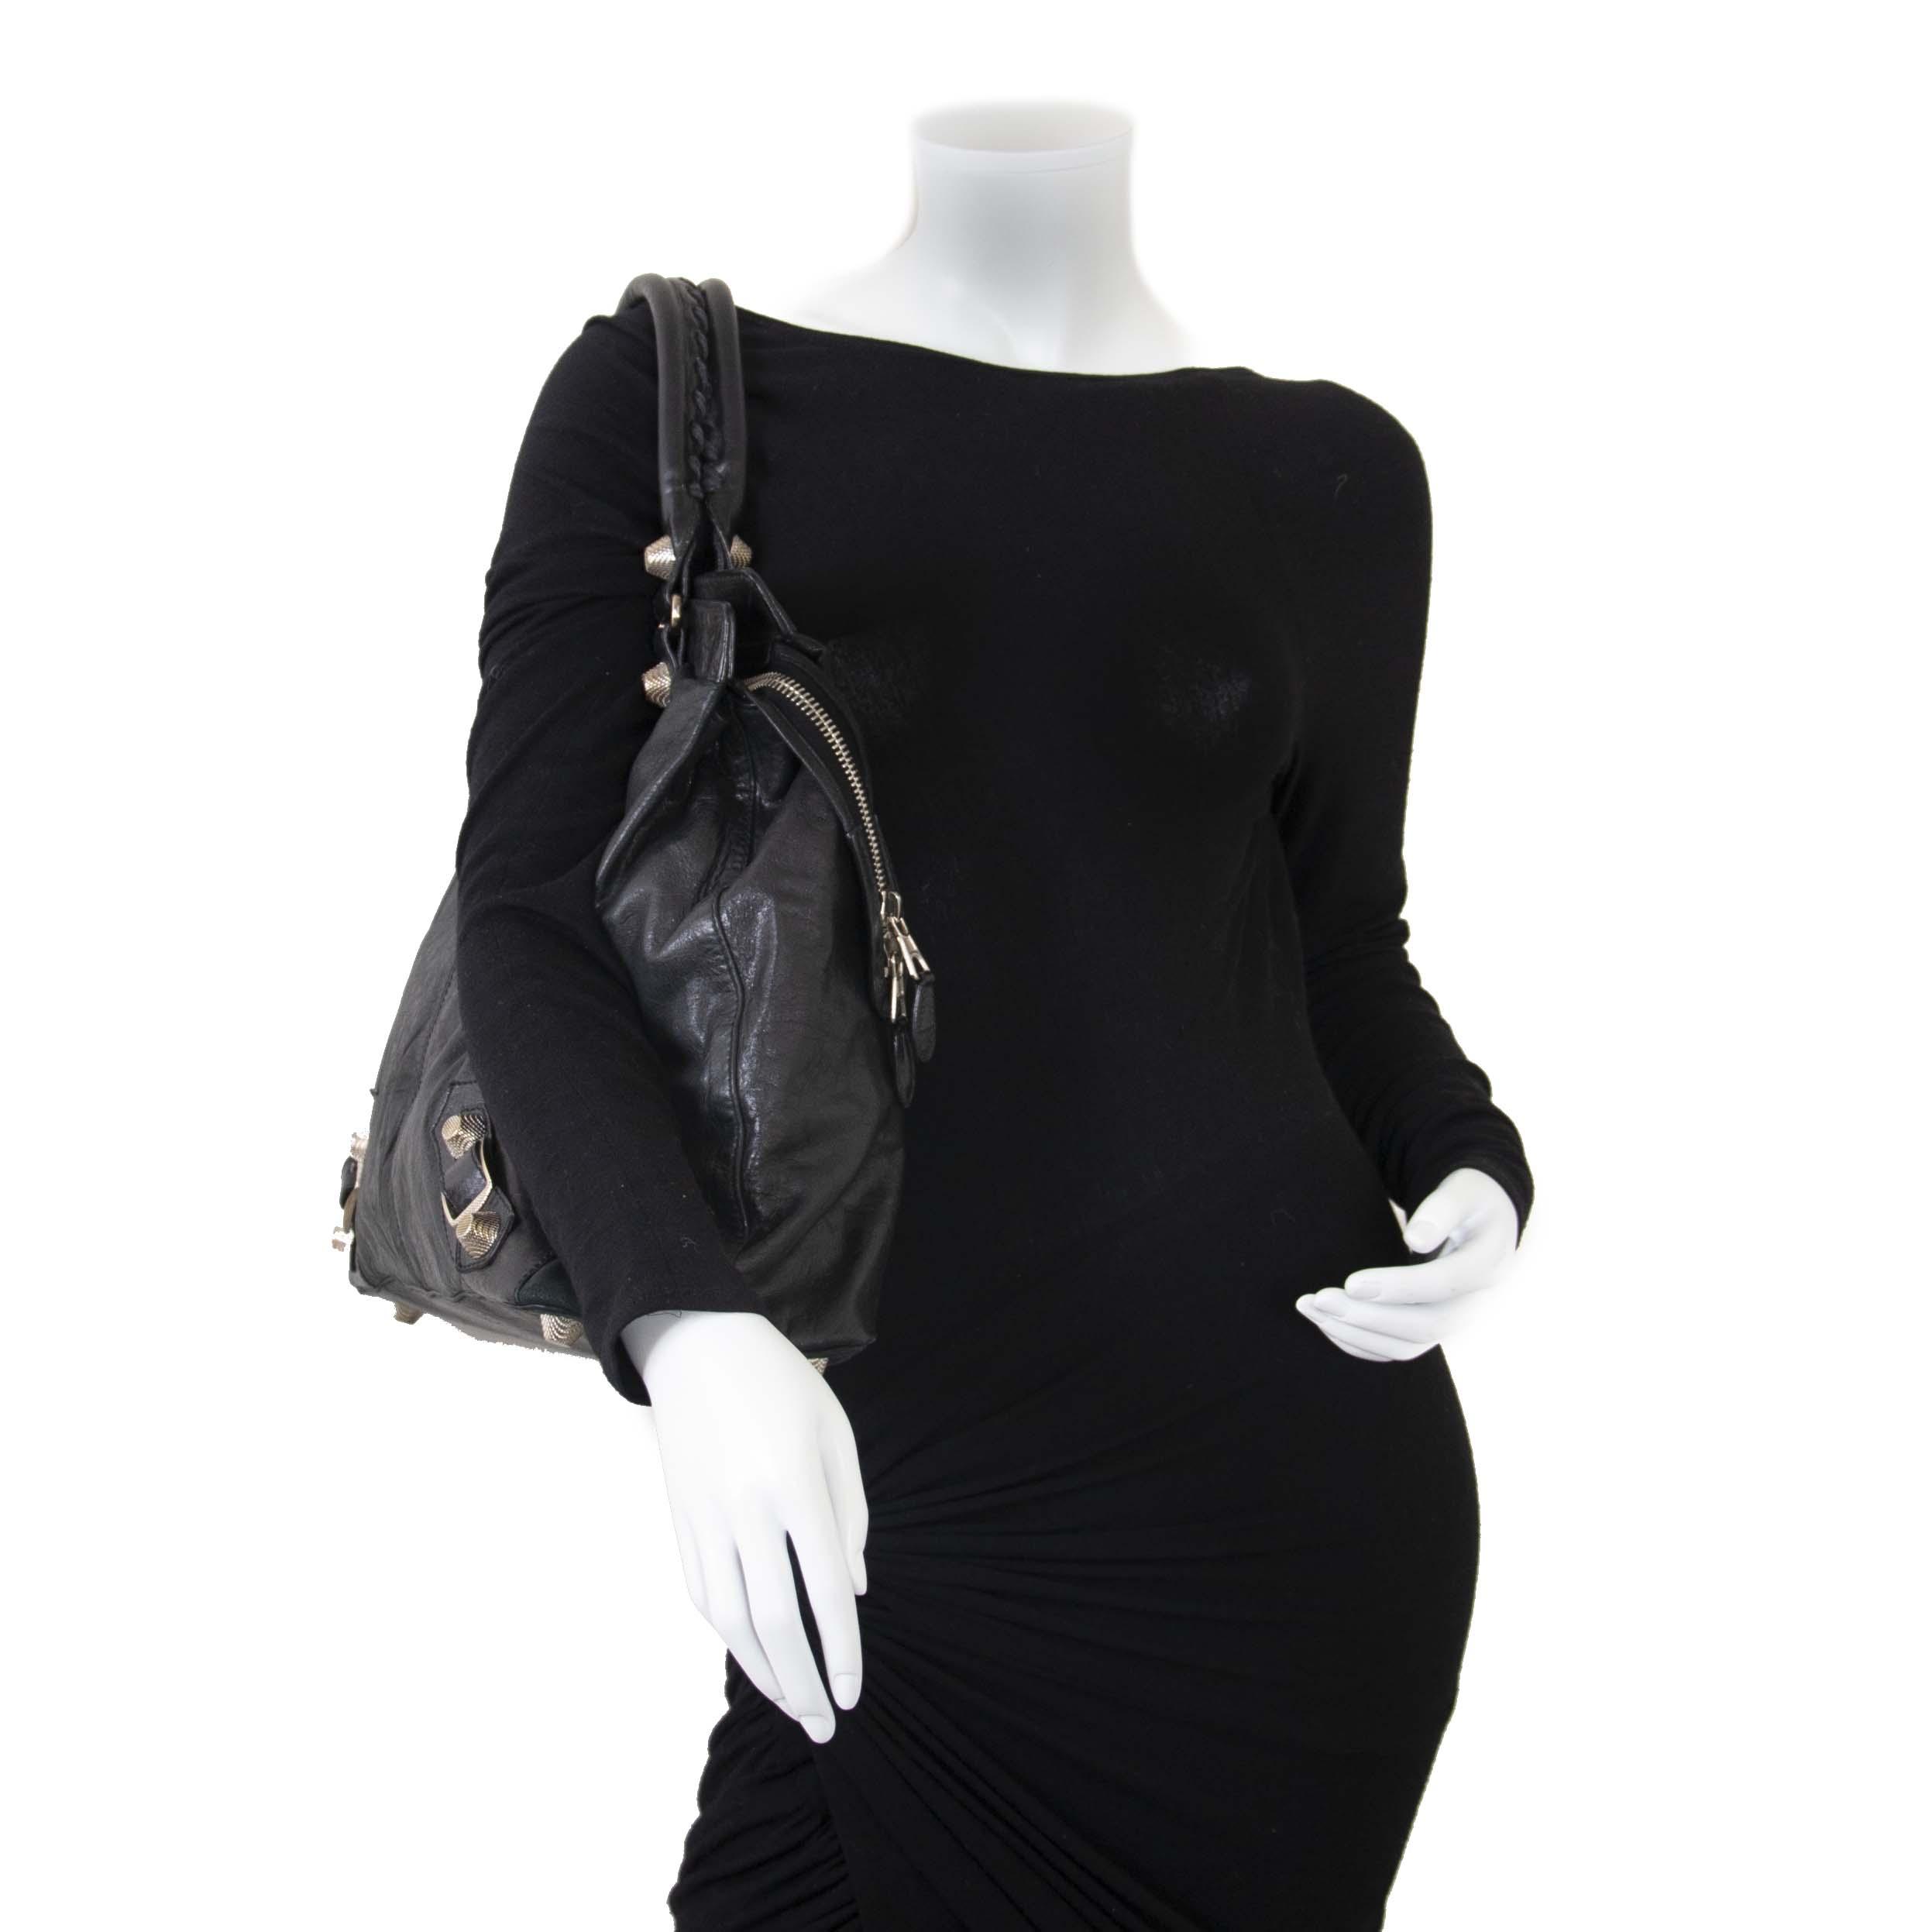 Balenciaga Black Leather RTT Shopper Bag